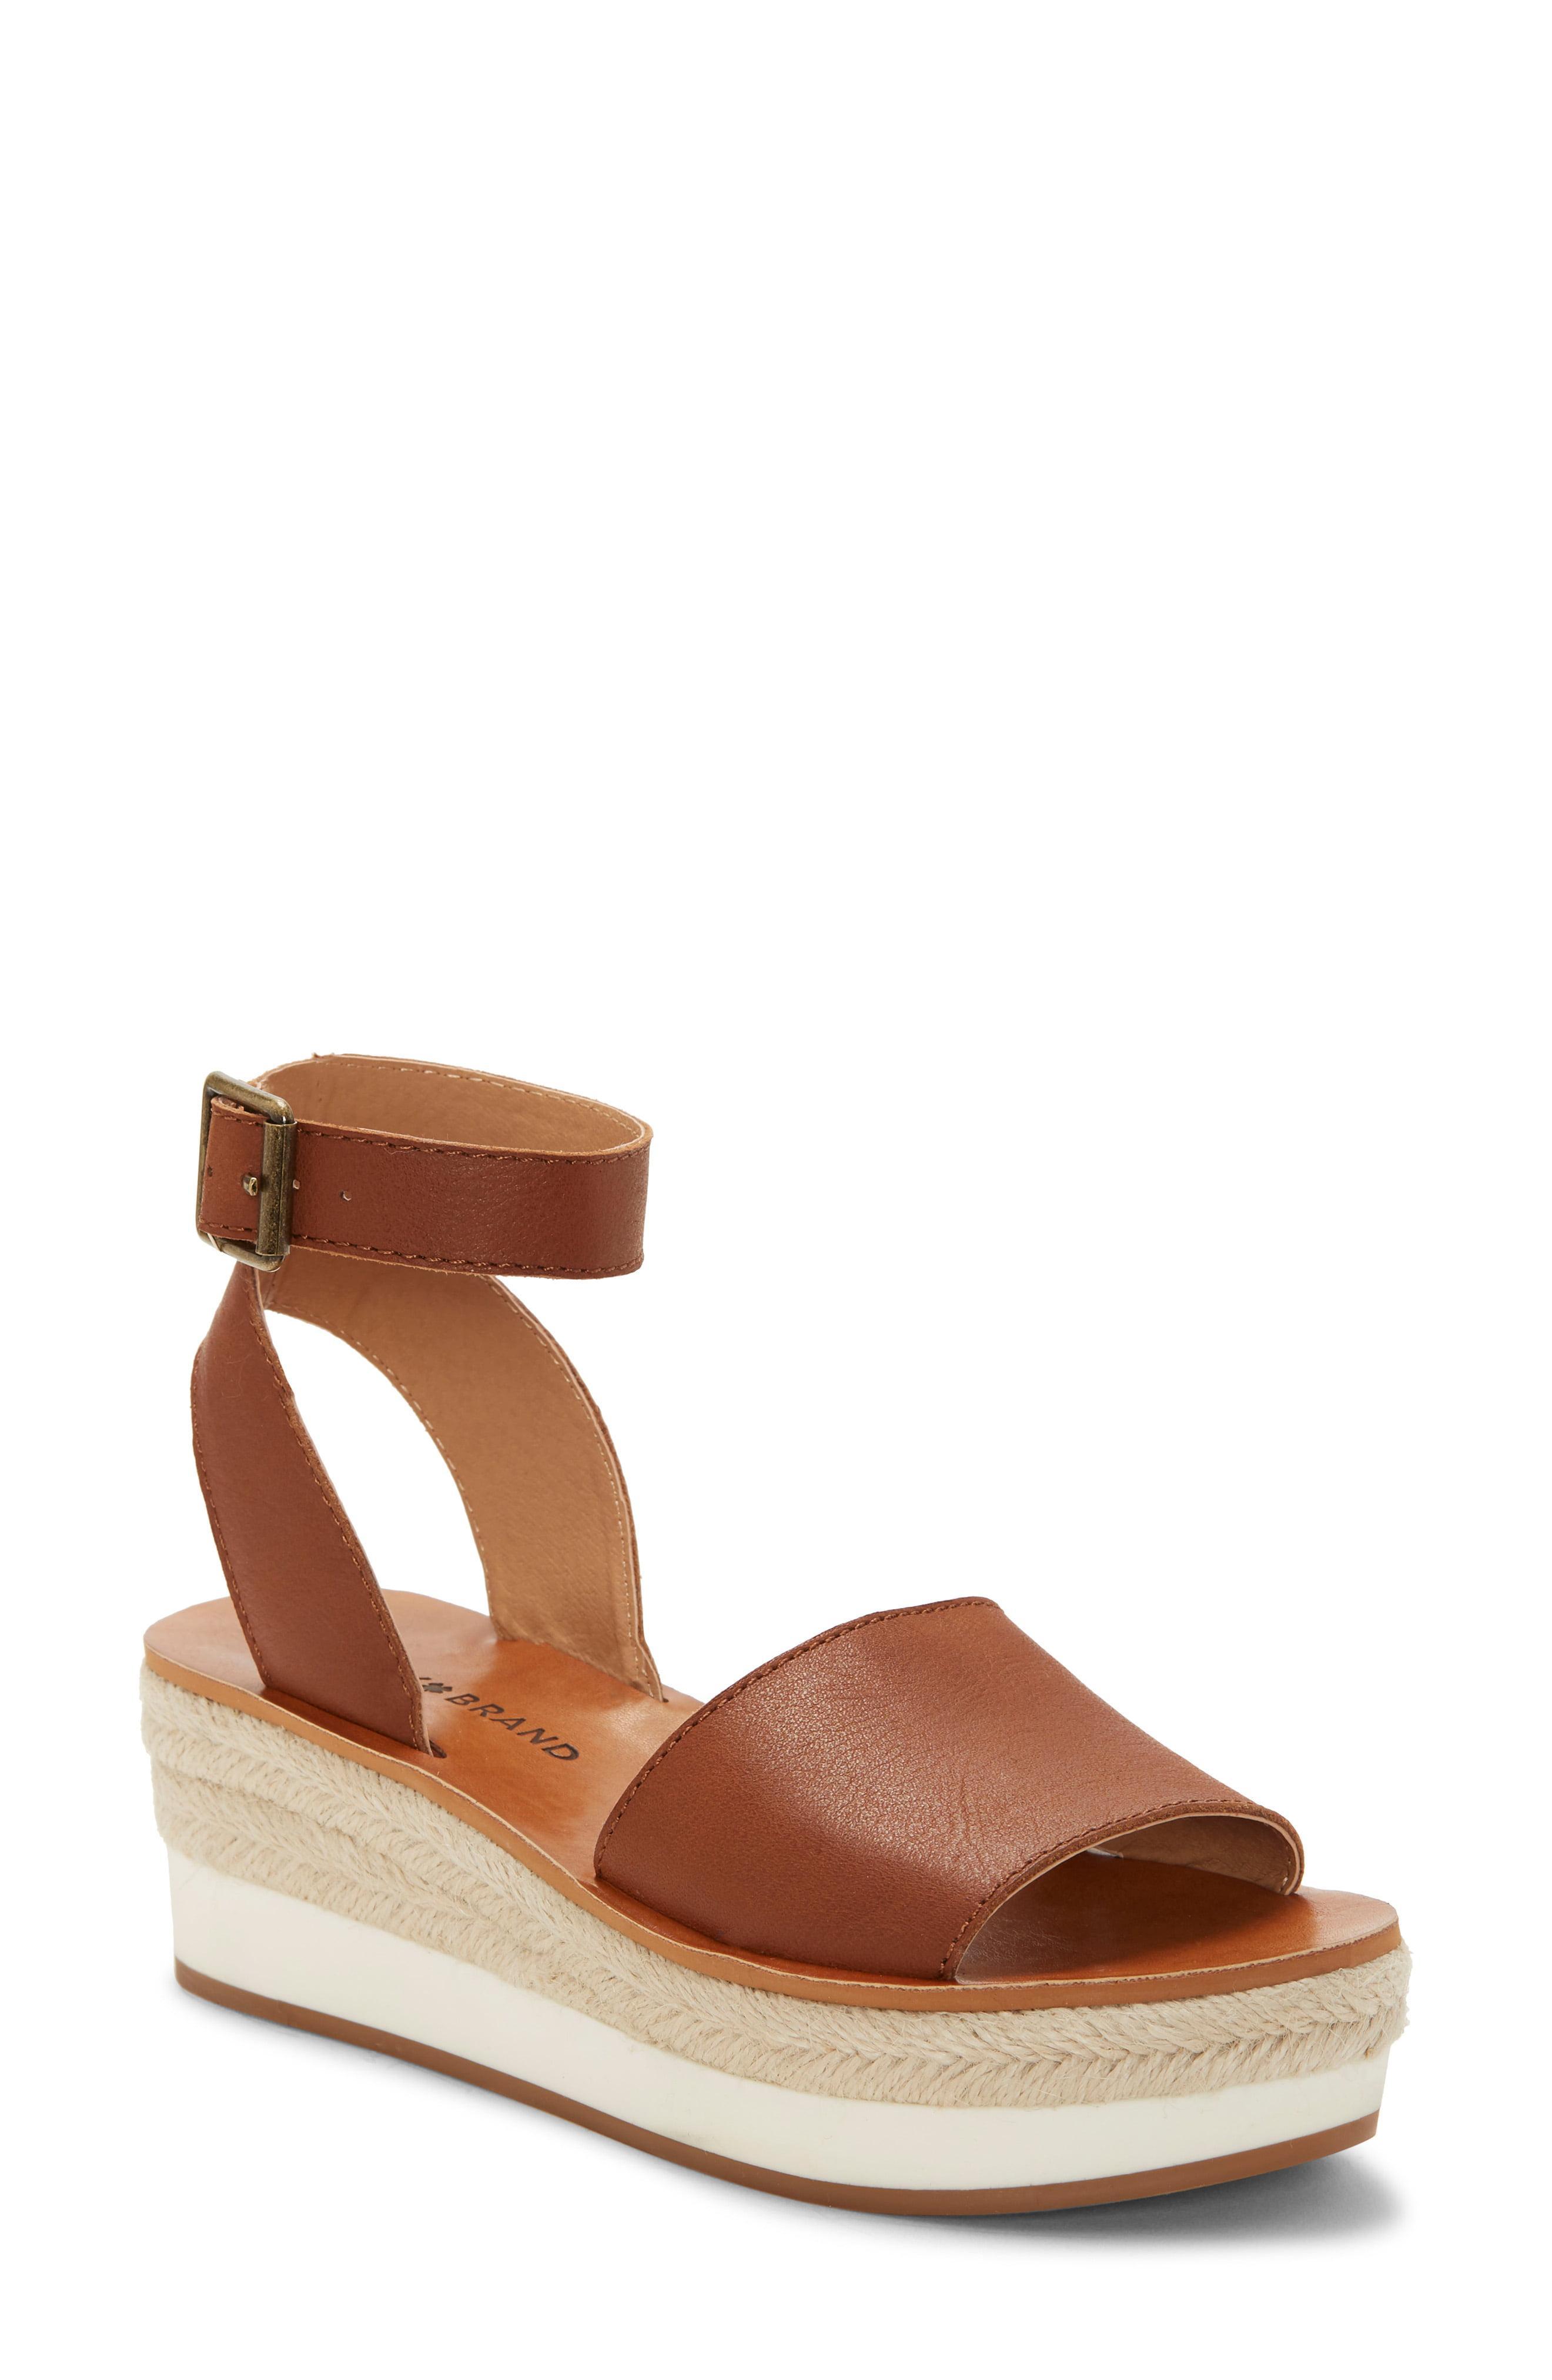 ee2d5b421 Lyst - Lucky Brand Joodith Platform Wedge Sandal in Brown